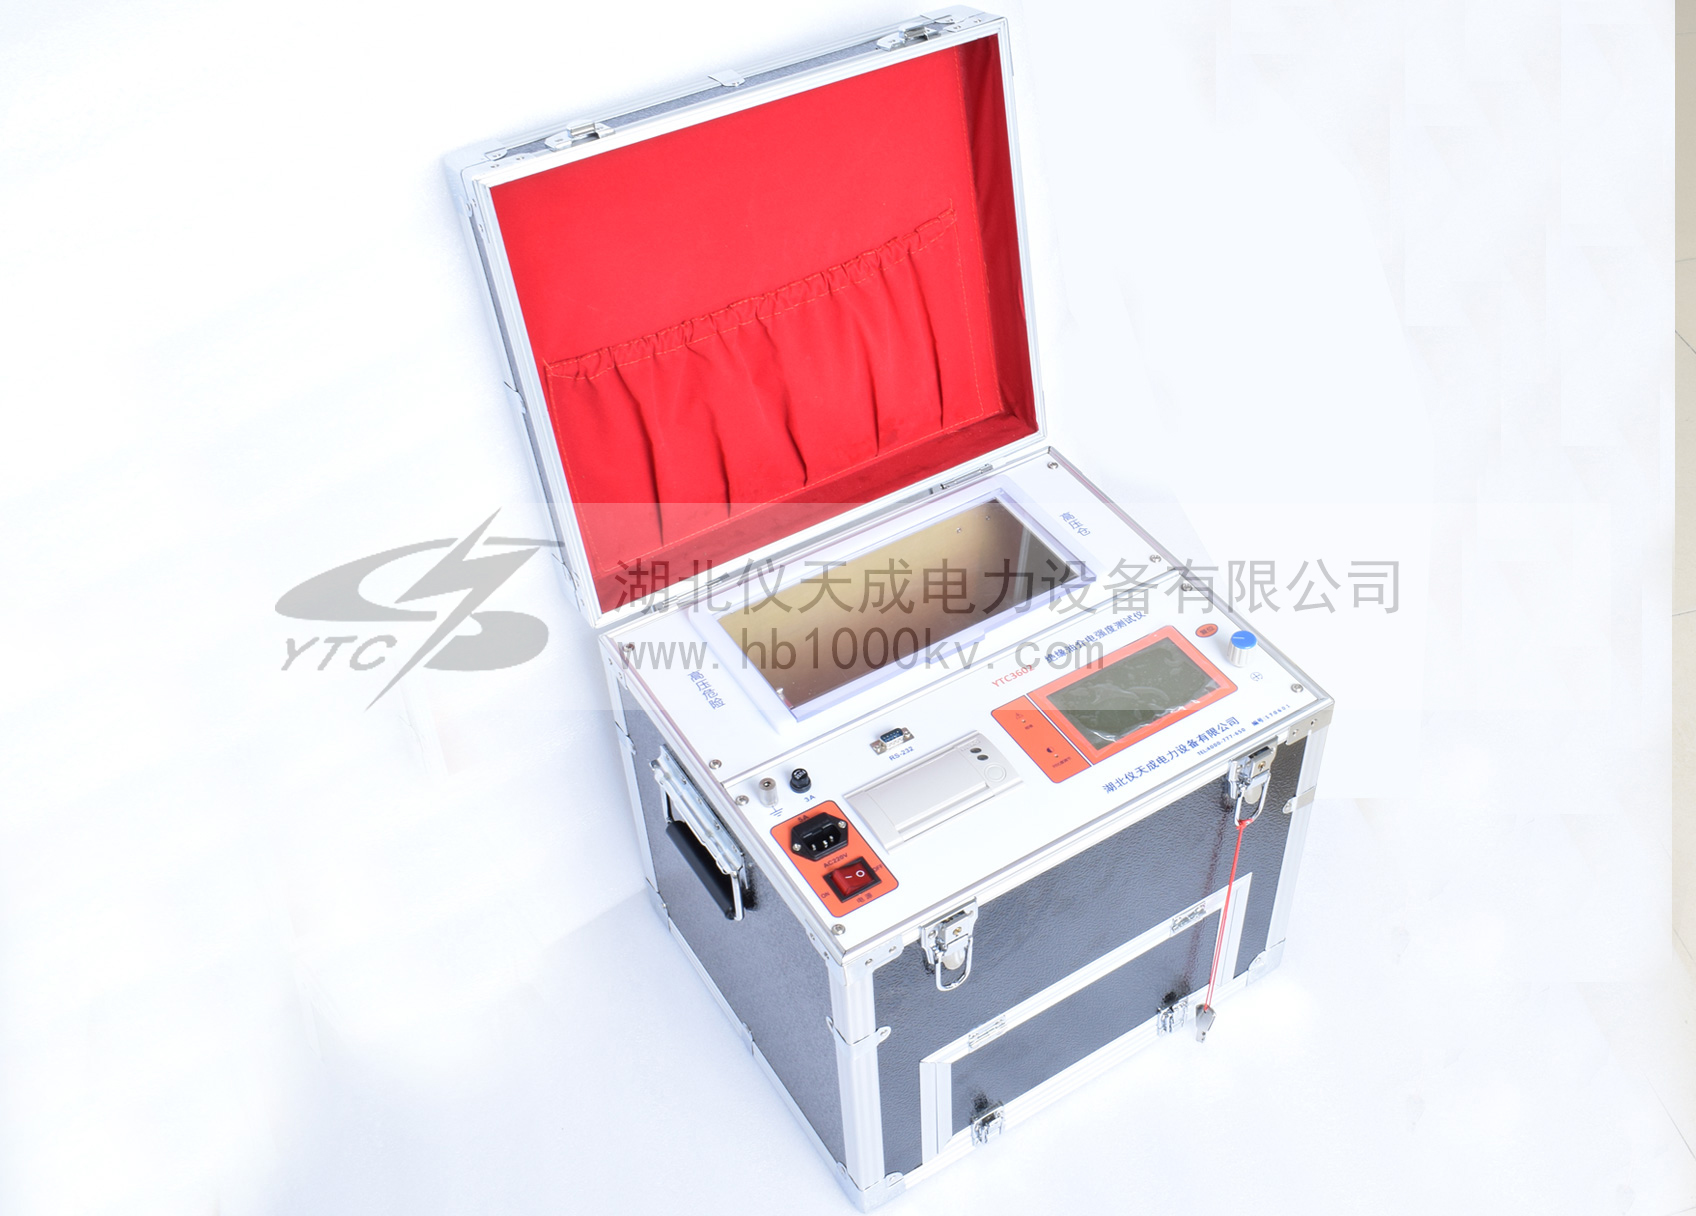 YTC3602绝缘油介电强度测试仪(单杯2)主机